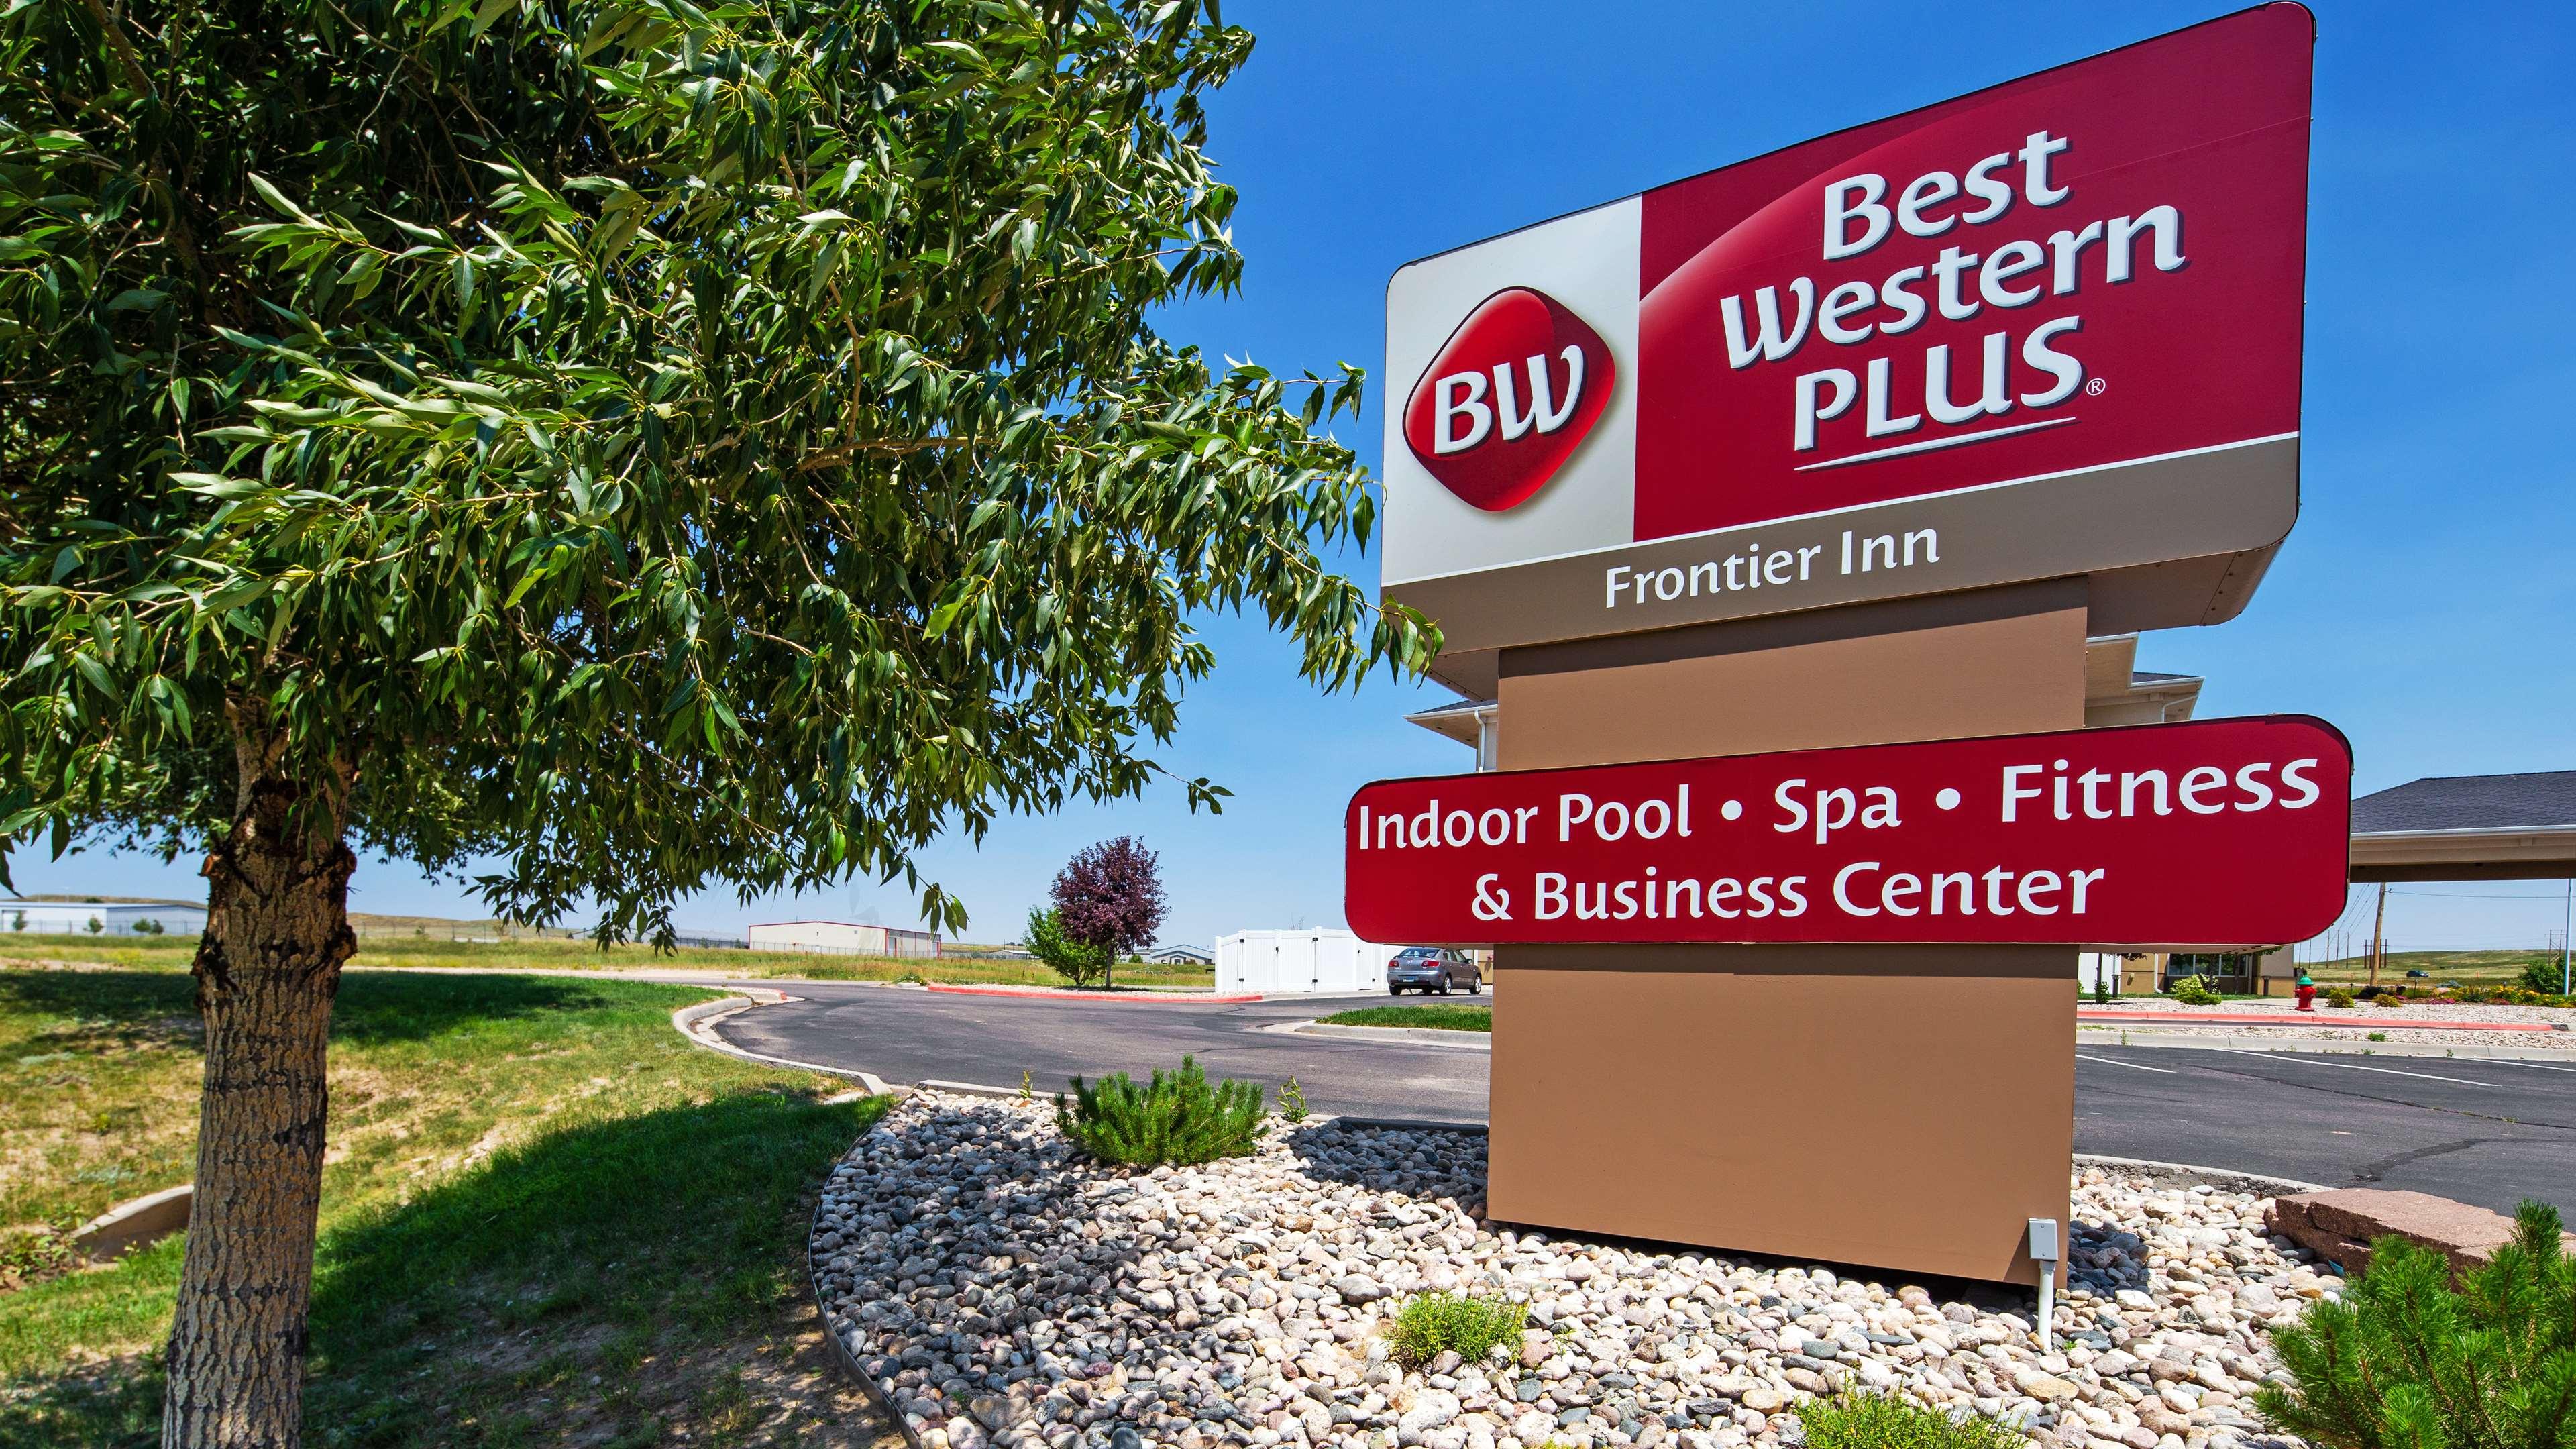 Best Western Plus Frontier Inn image 2